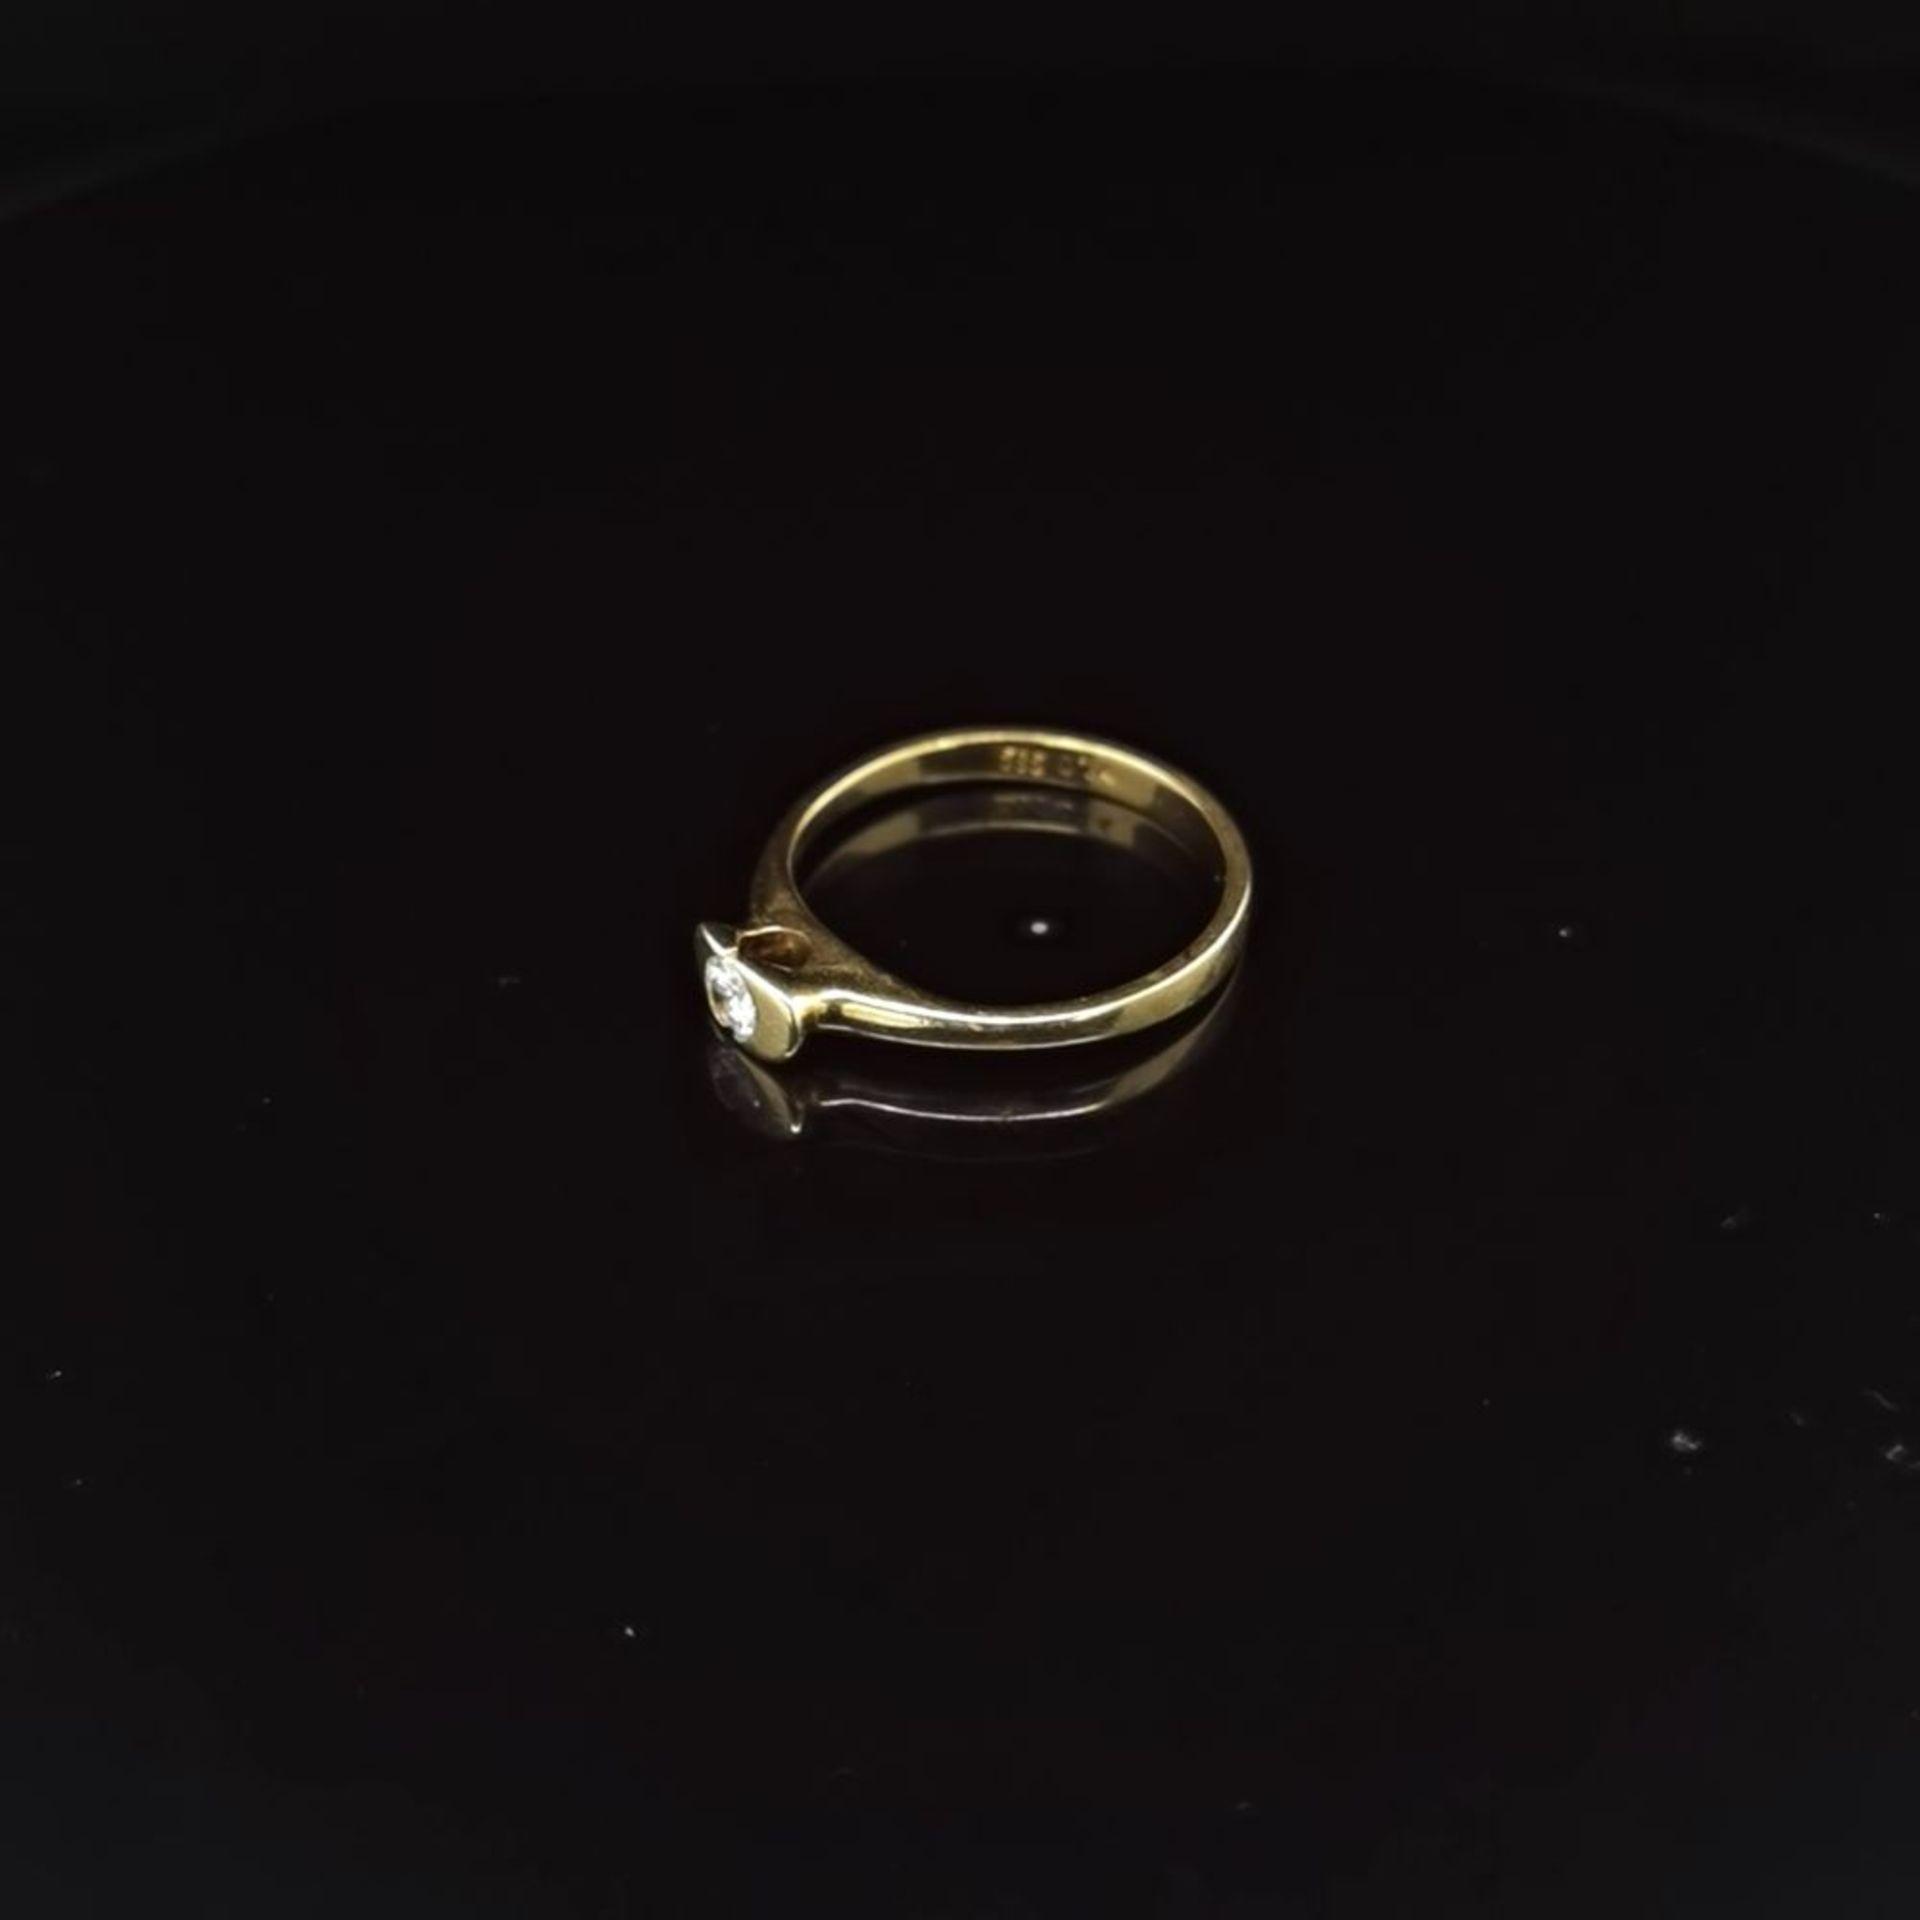 Brillant-Ring, 585 Gelbgold 2 - Image 2 of 3